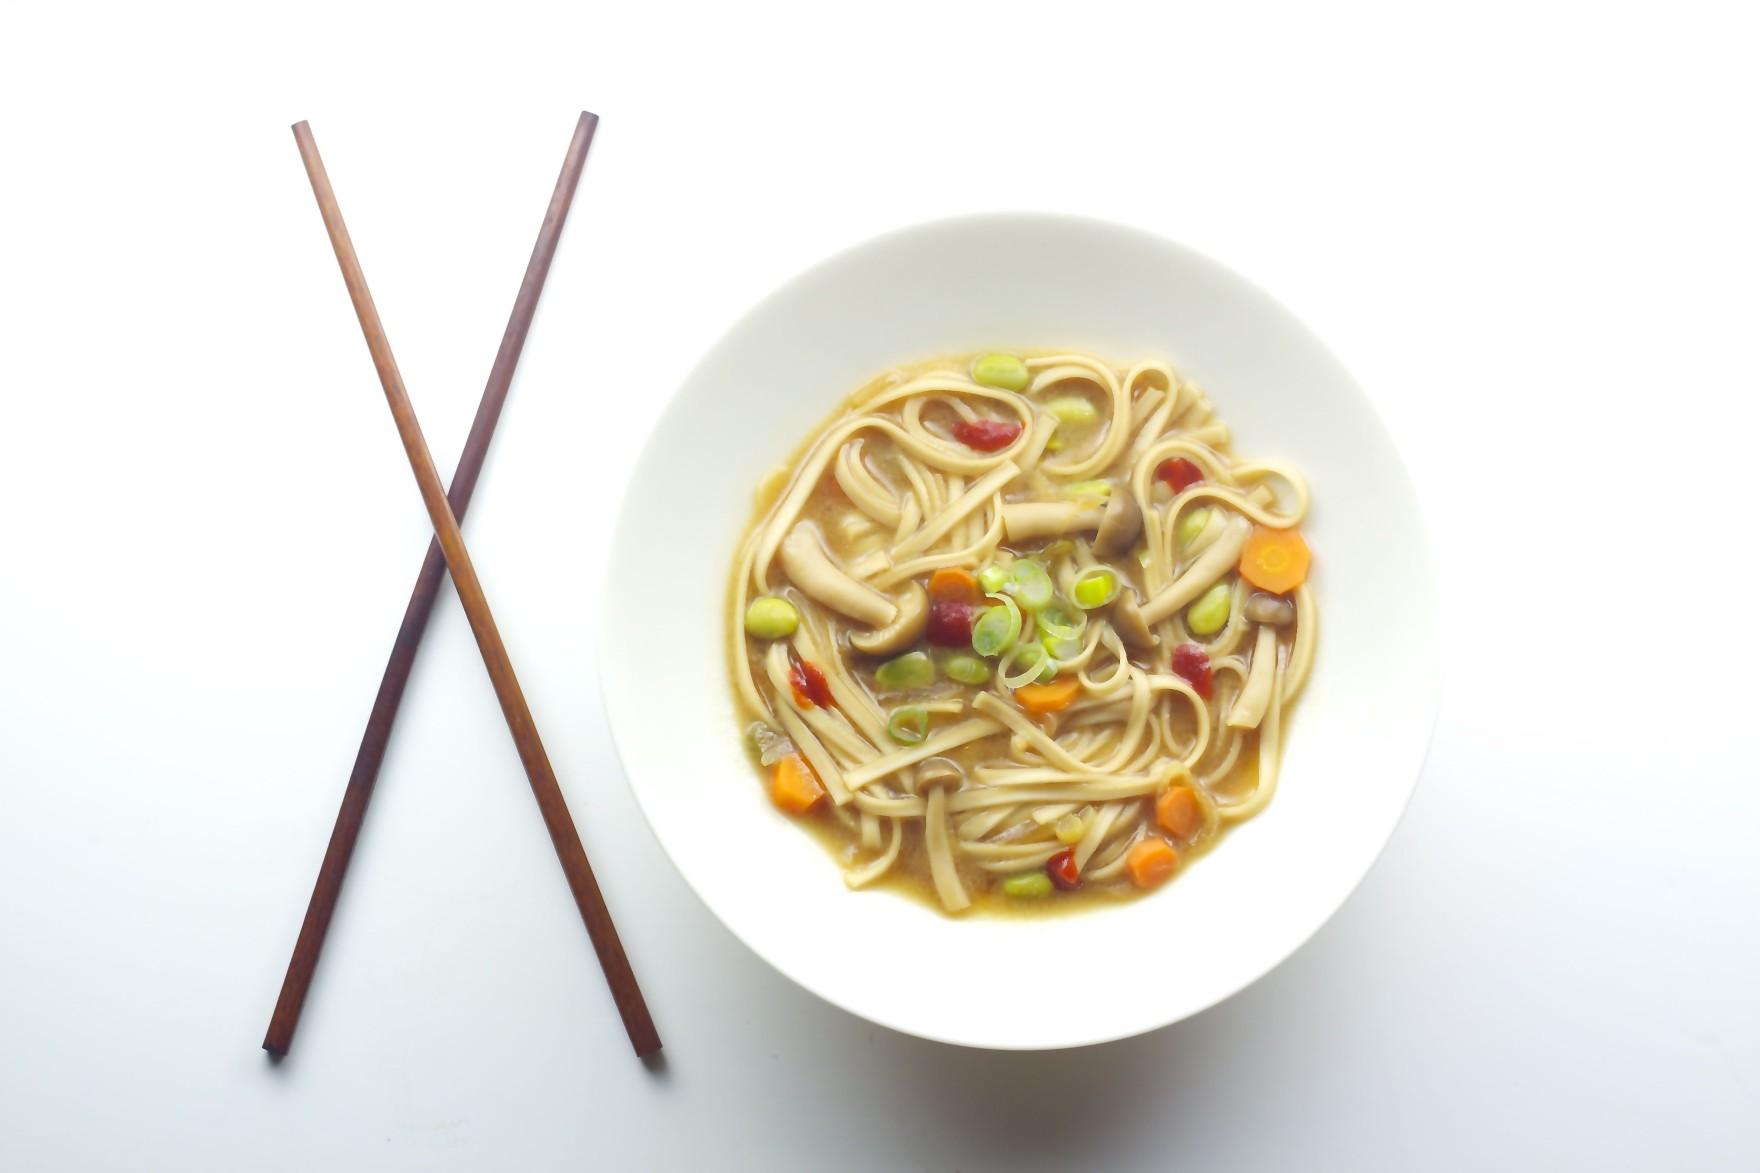 vegan vegetable udon soup miso carrots mushrooms edamame bored vegetarian